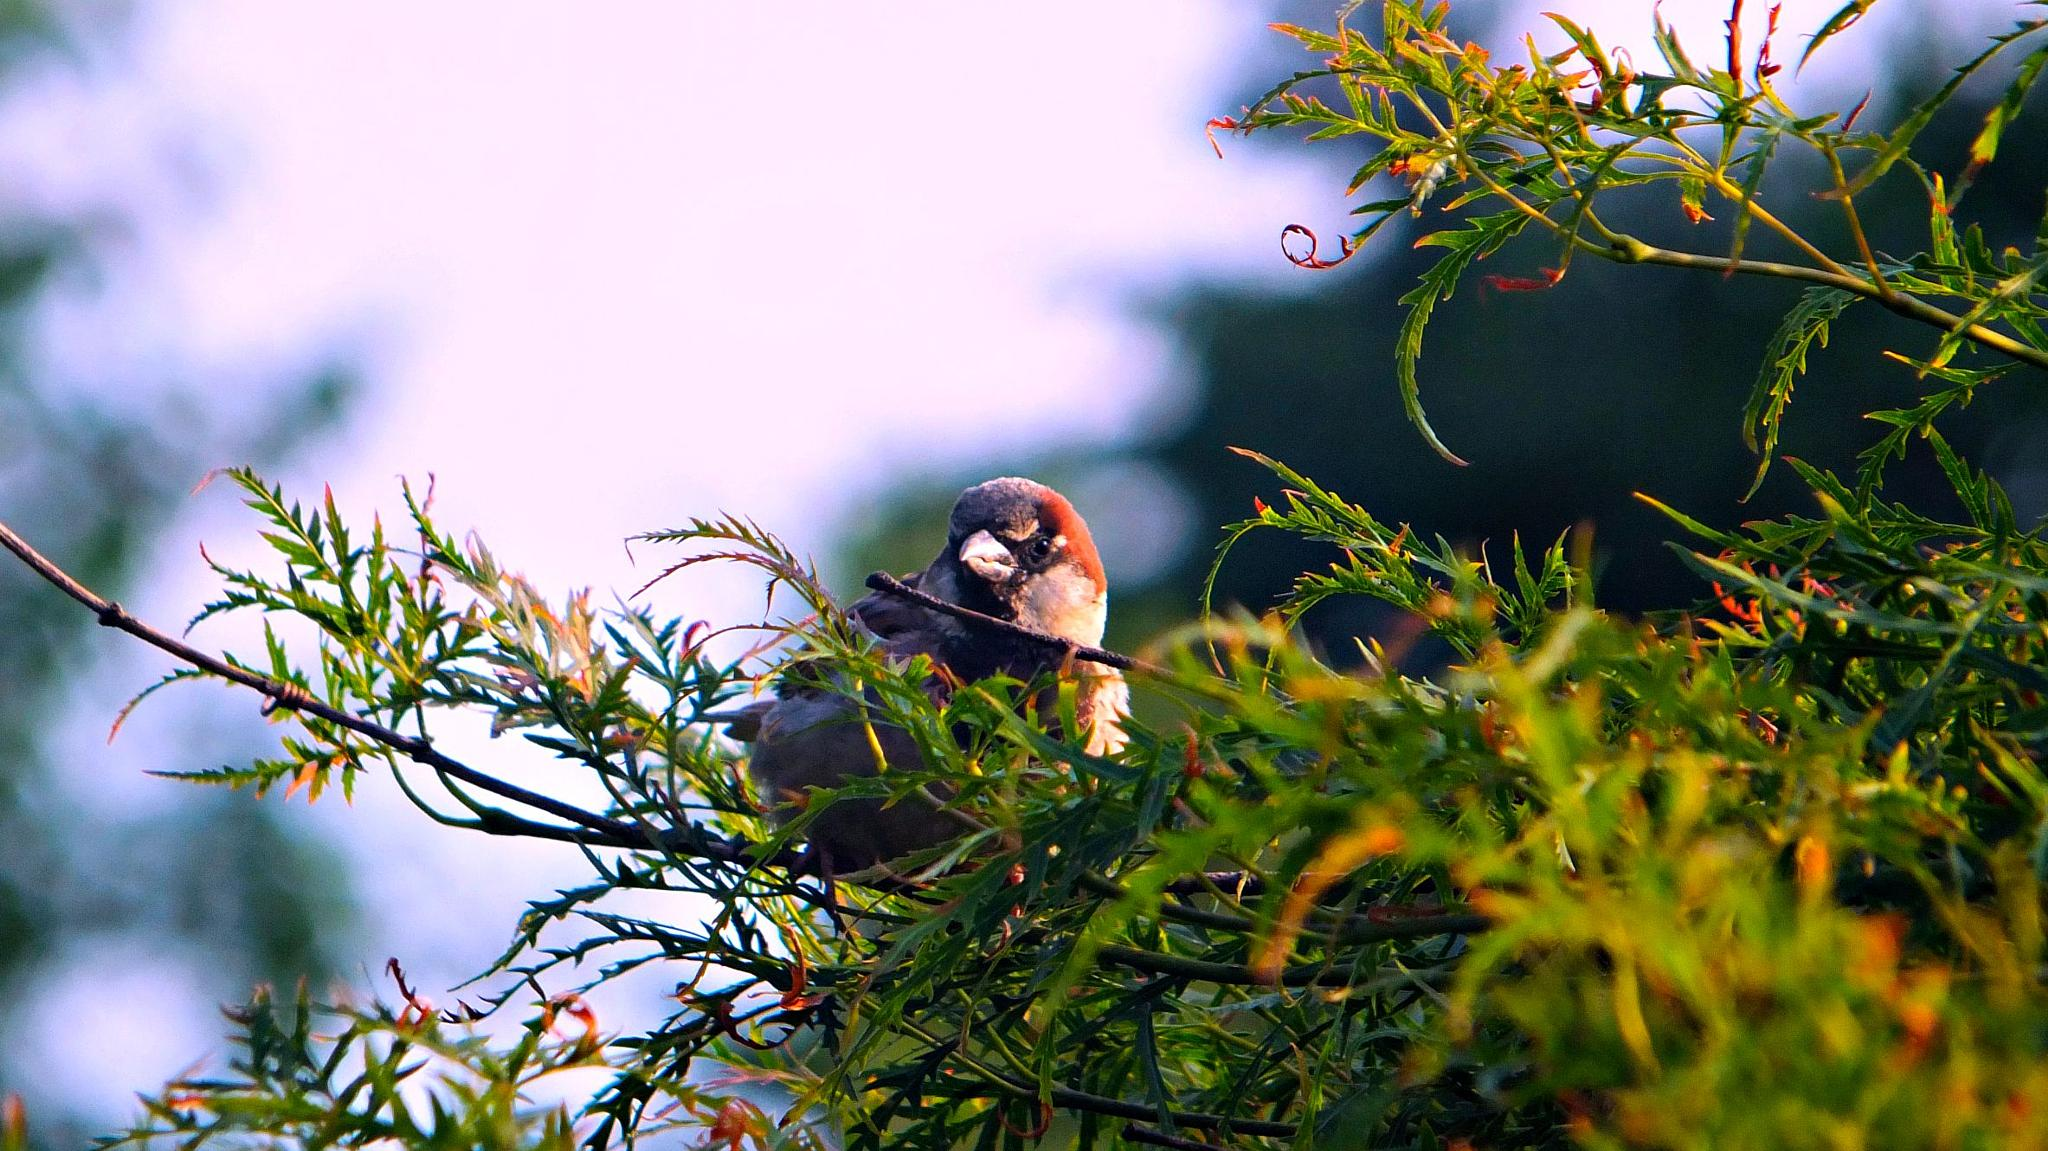 scowling bird by pattids